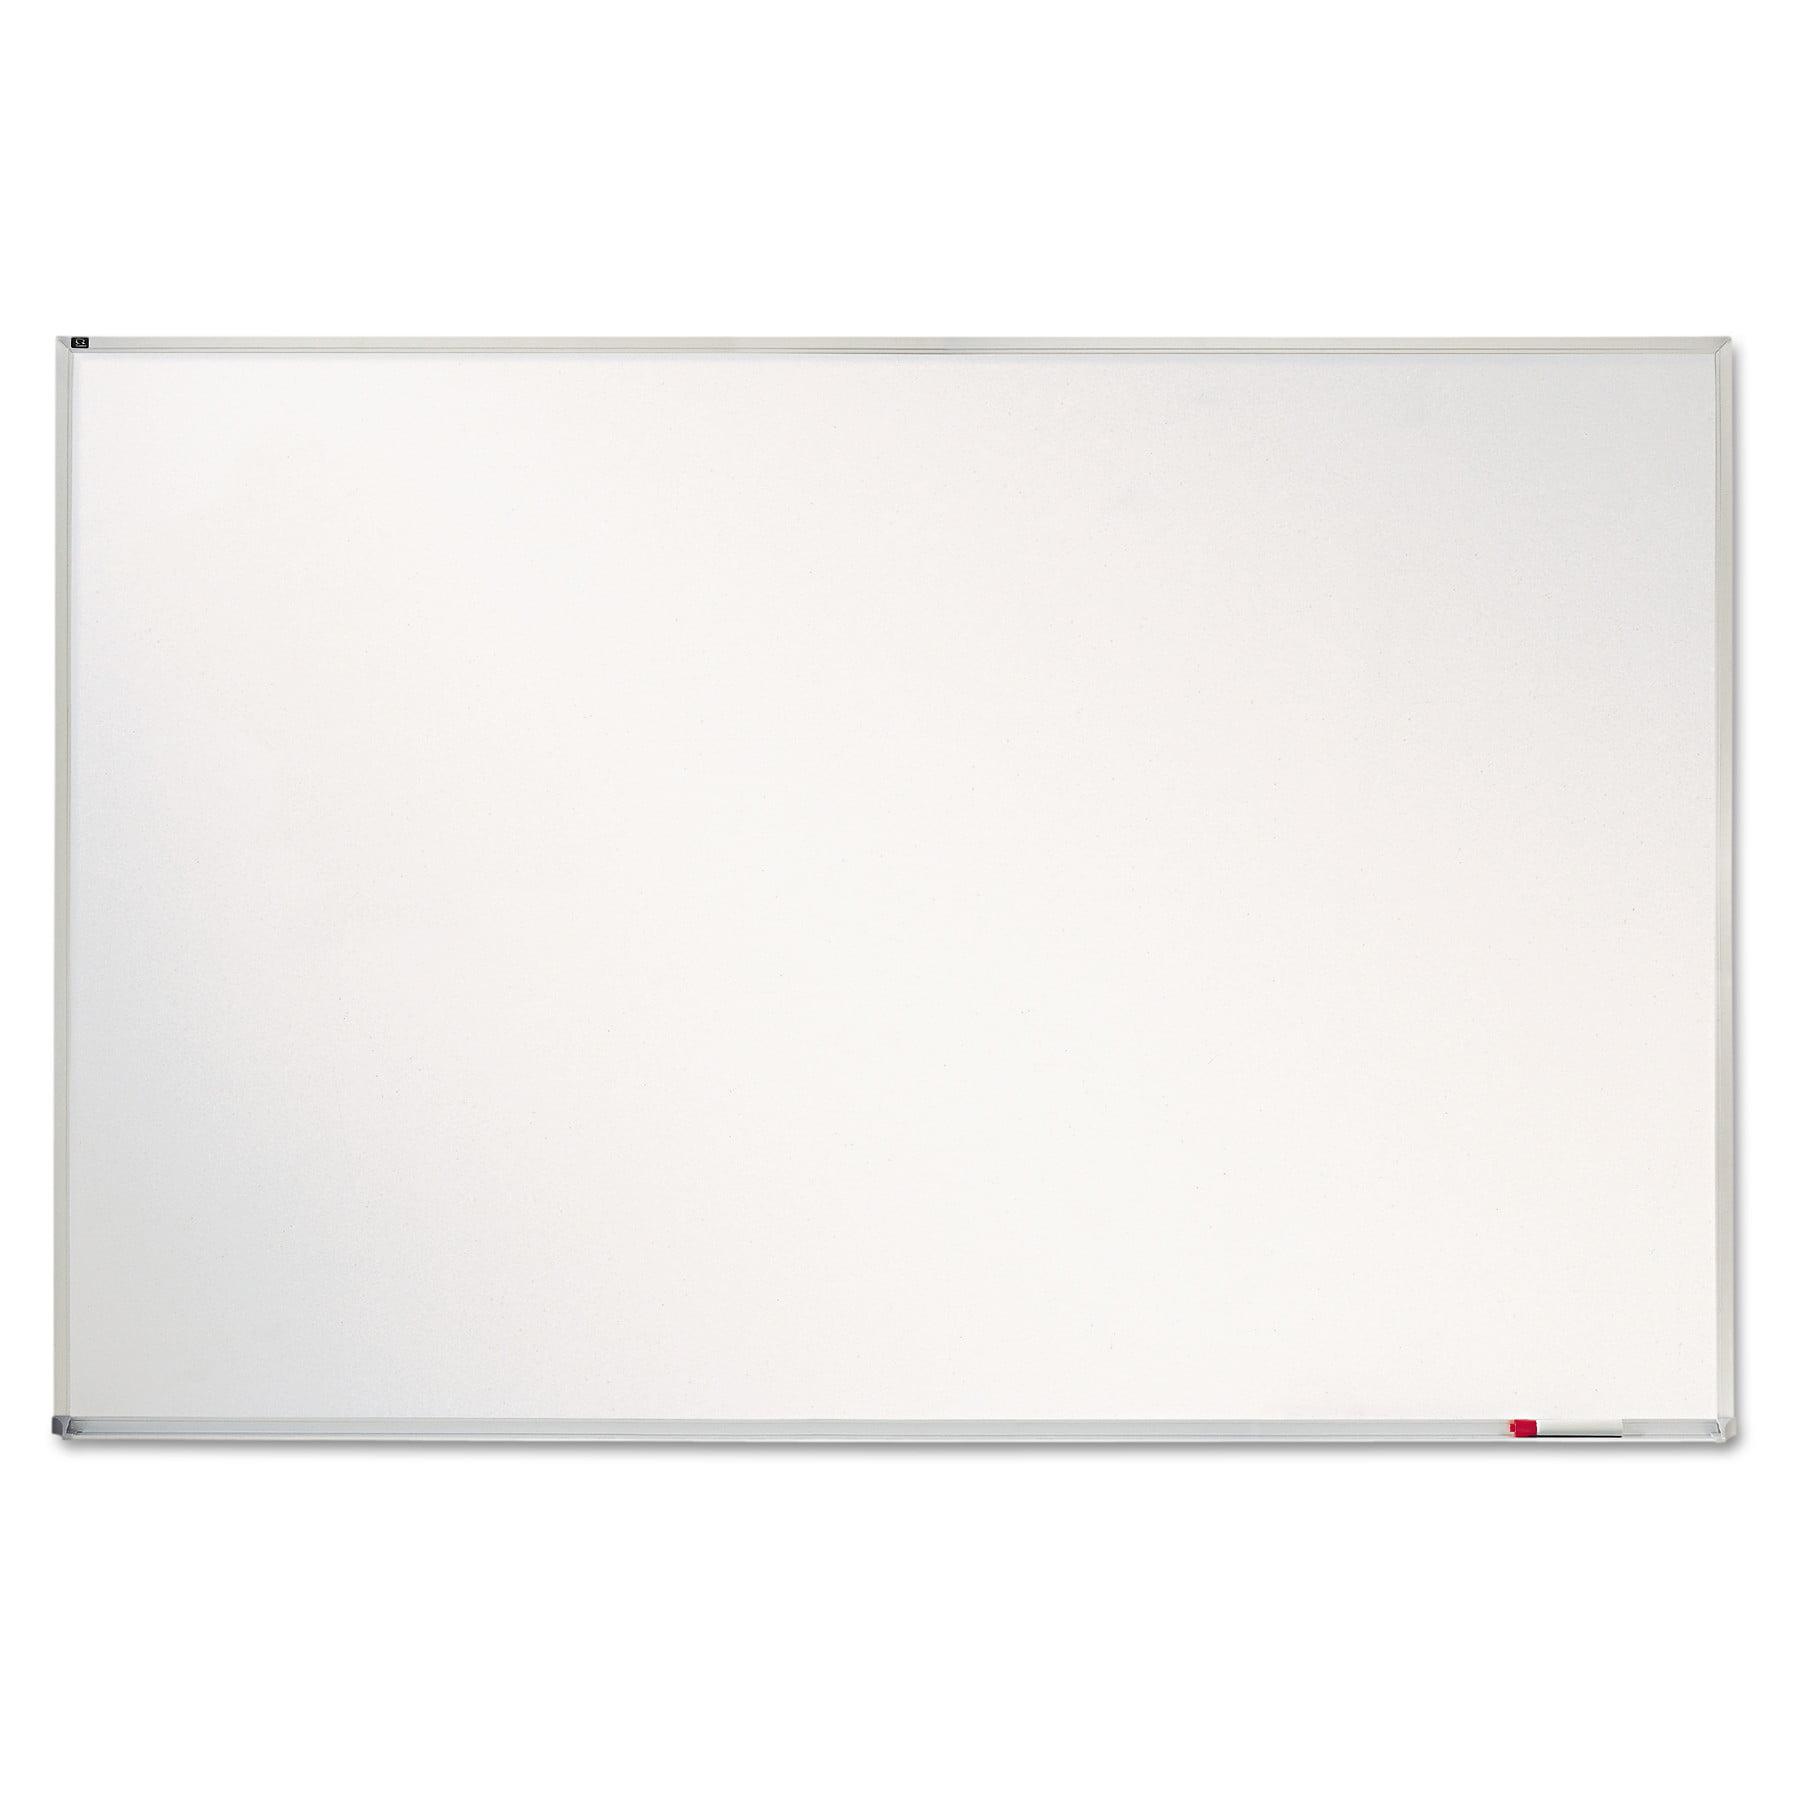 "Quartet Porcelain Magnetic Whiteboard, 72"" x 48"", Aluminum Frame"